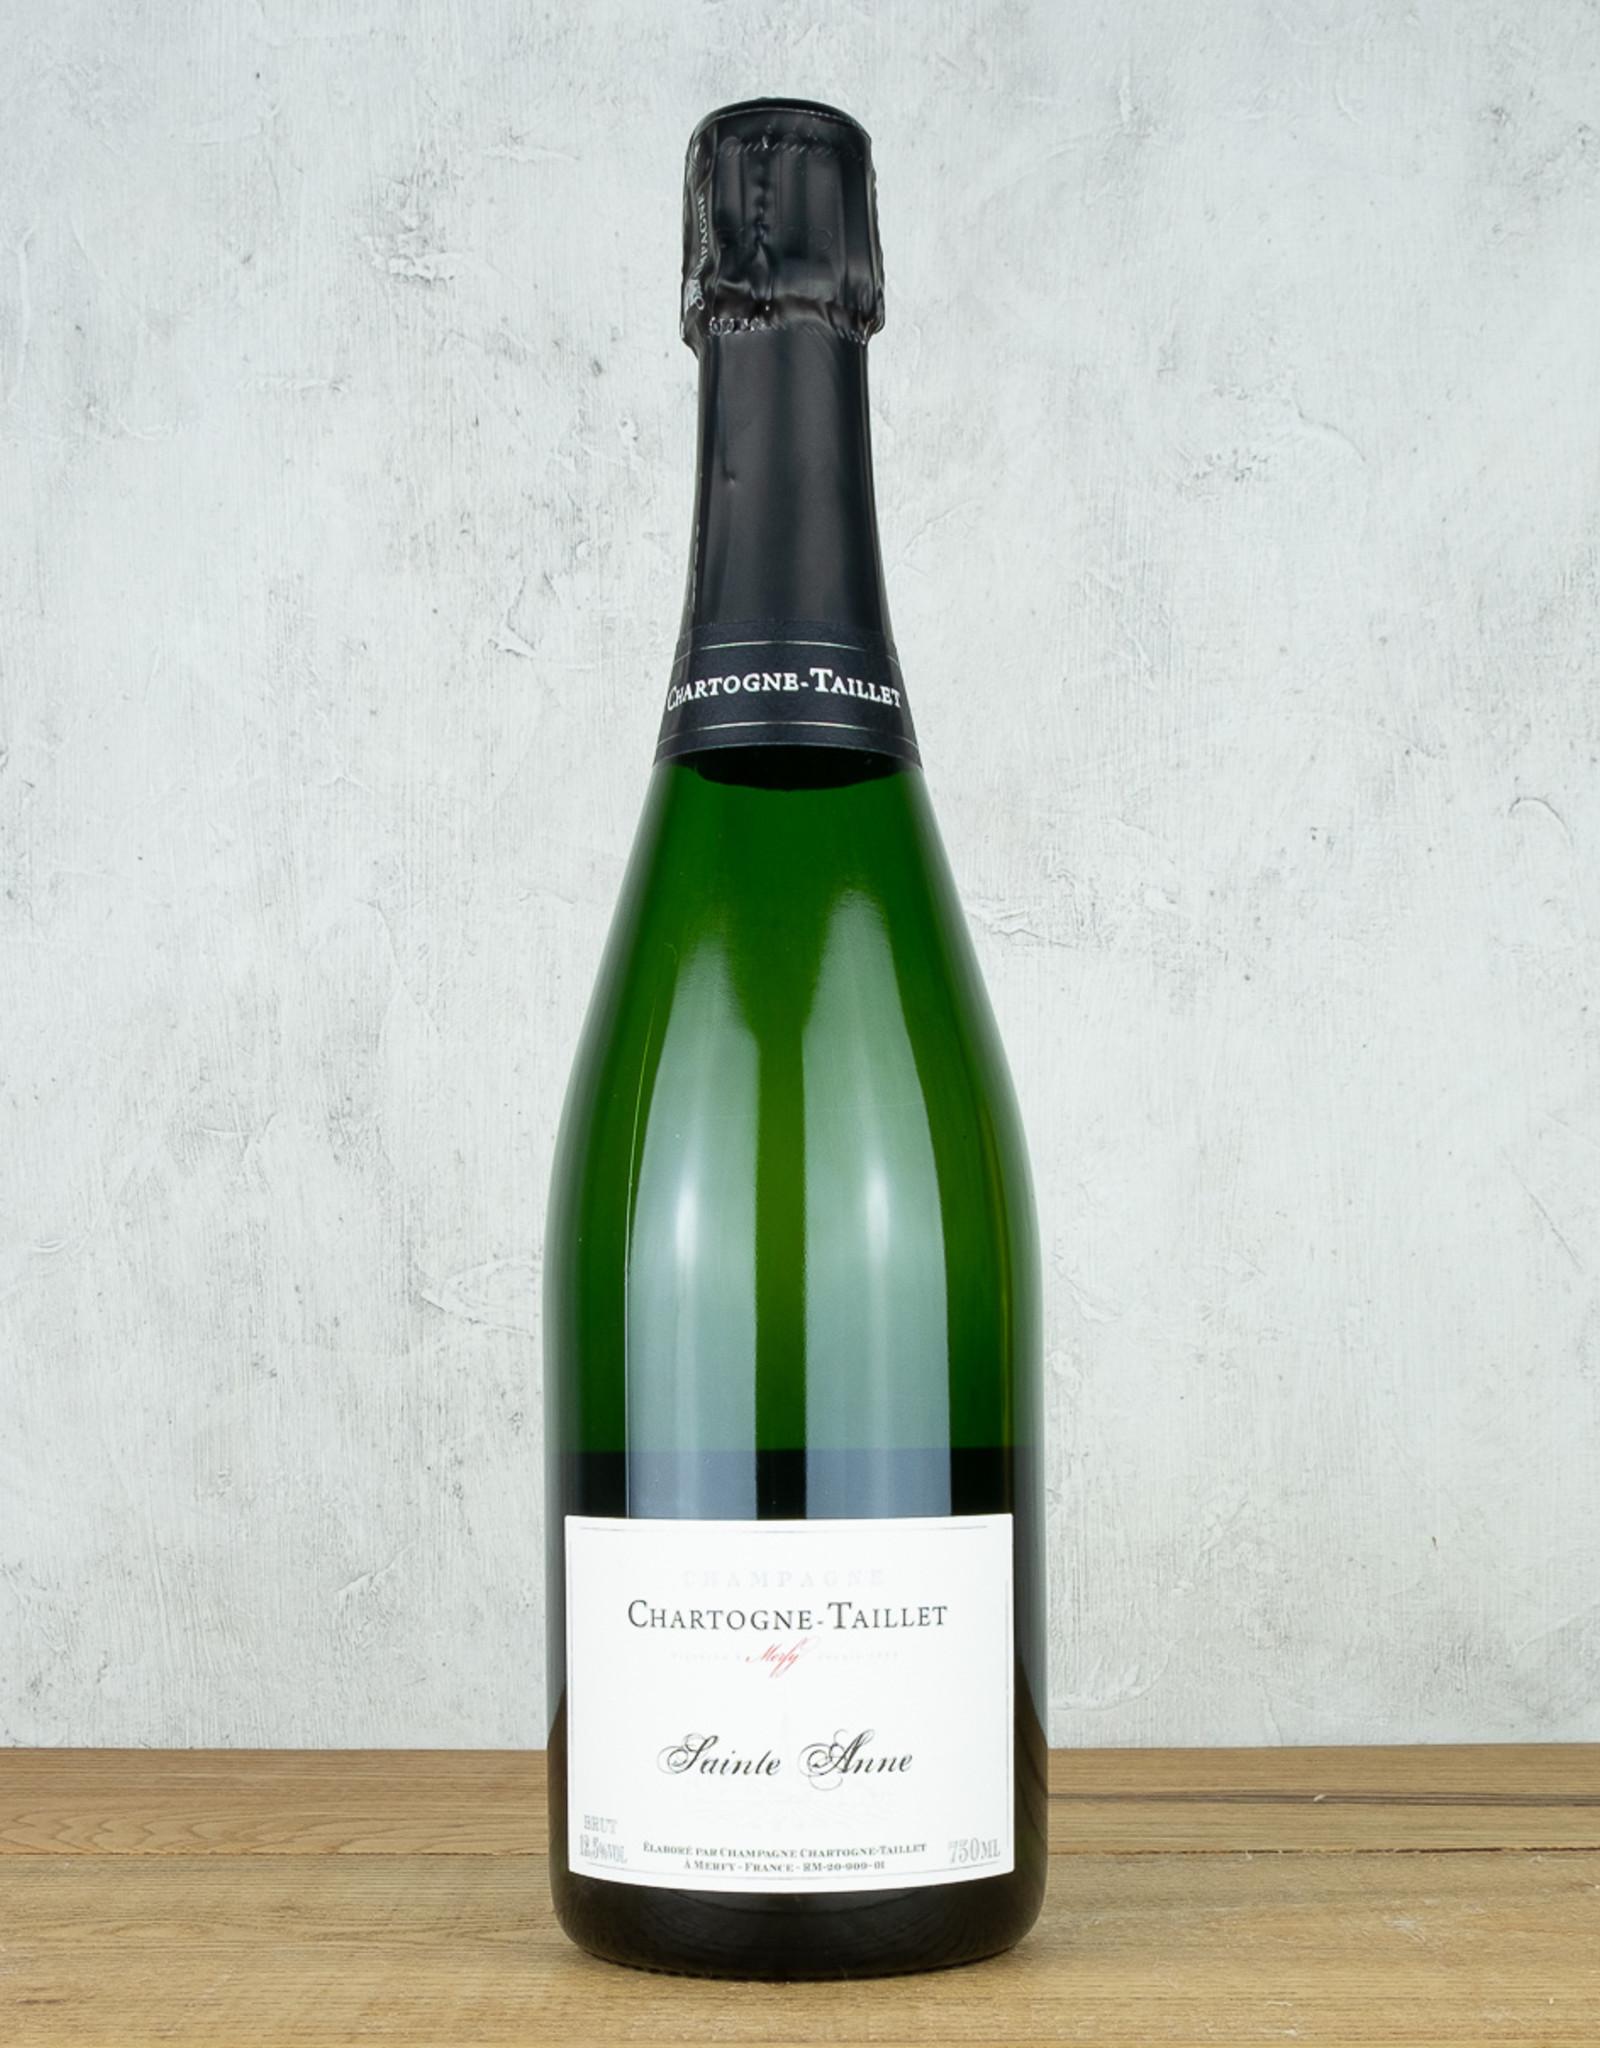 Champagne Chartogne Taillet Cuvee Sainte Anne